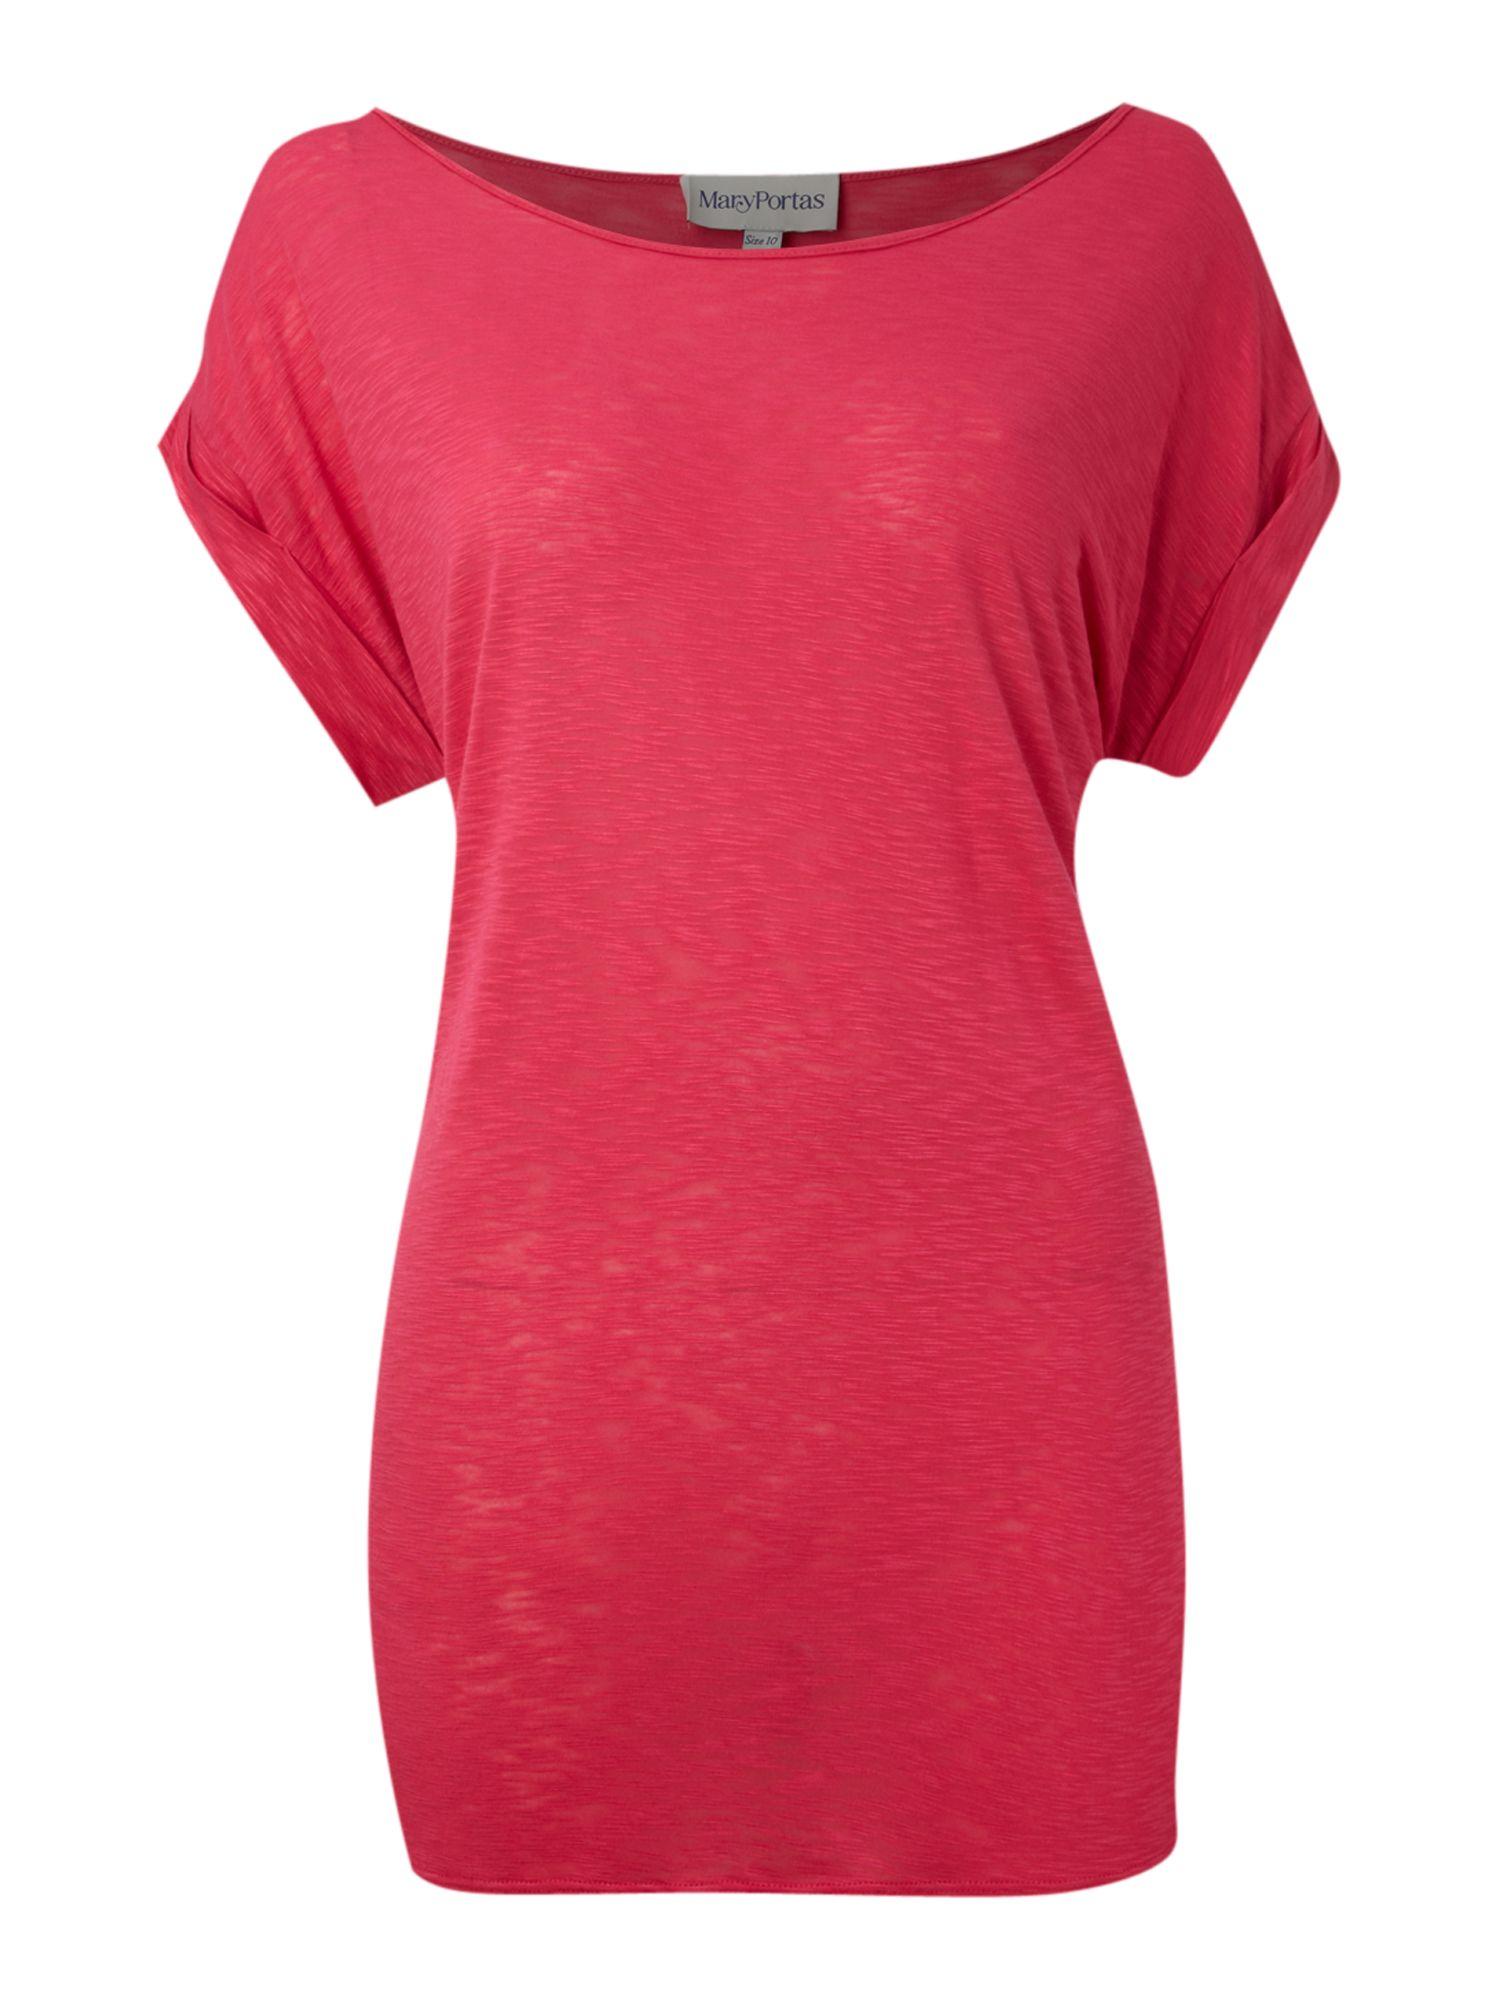 Lyst - Mary Portas Slub Box Jersey Tee Top in Purple